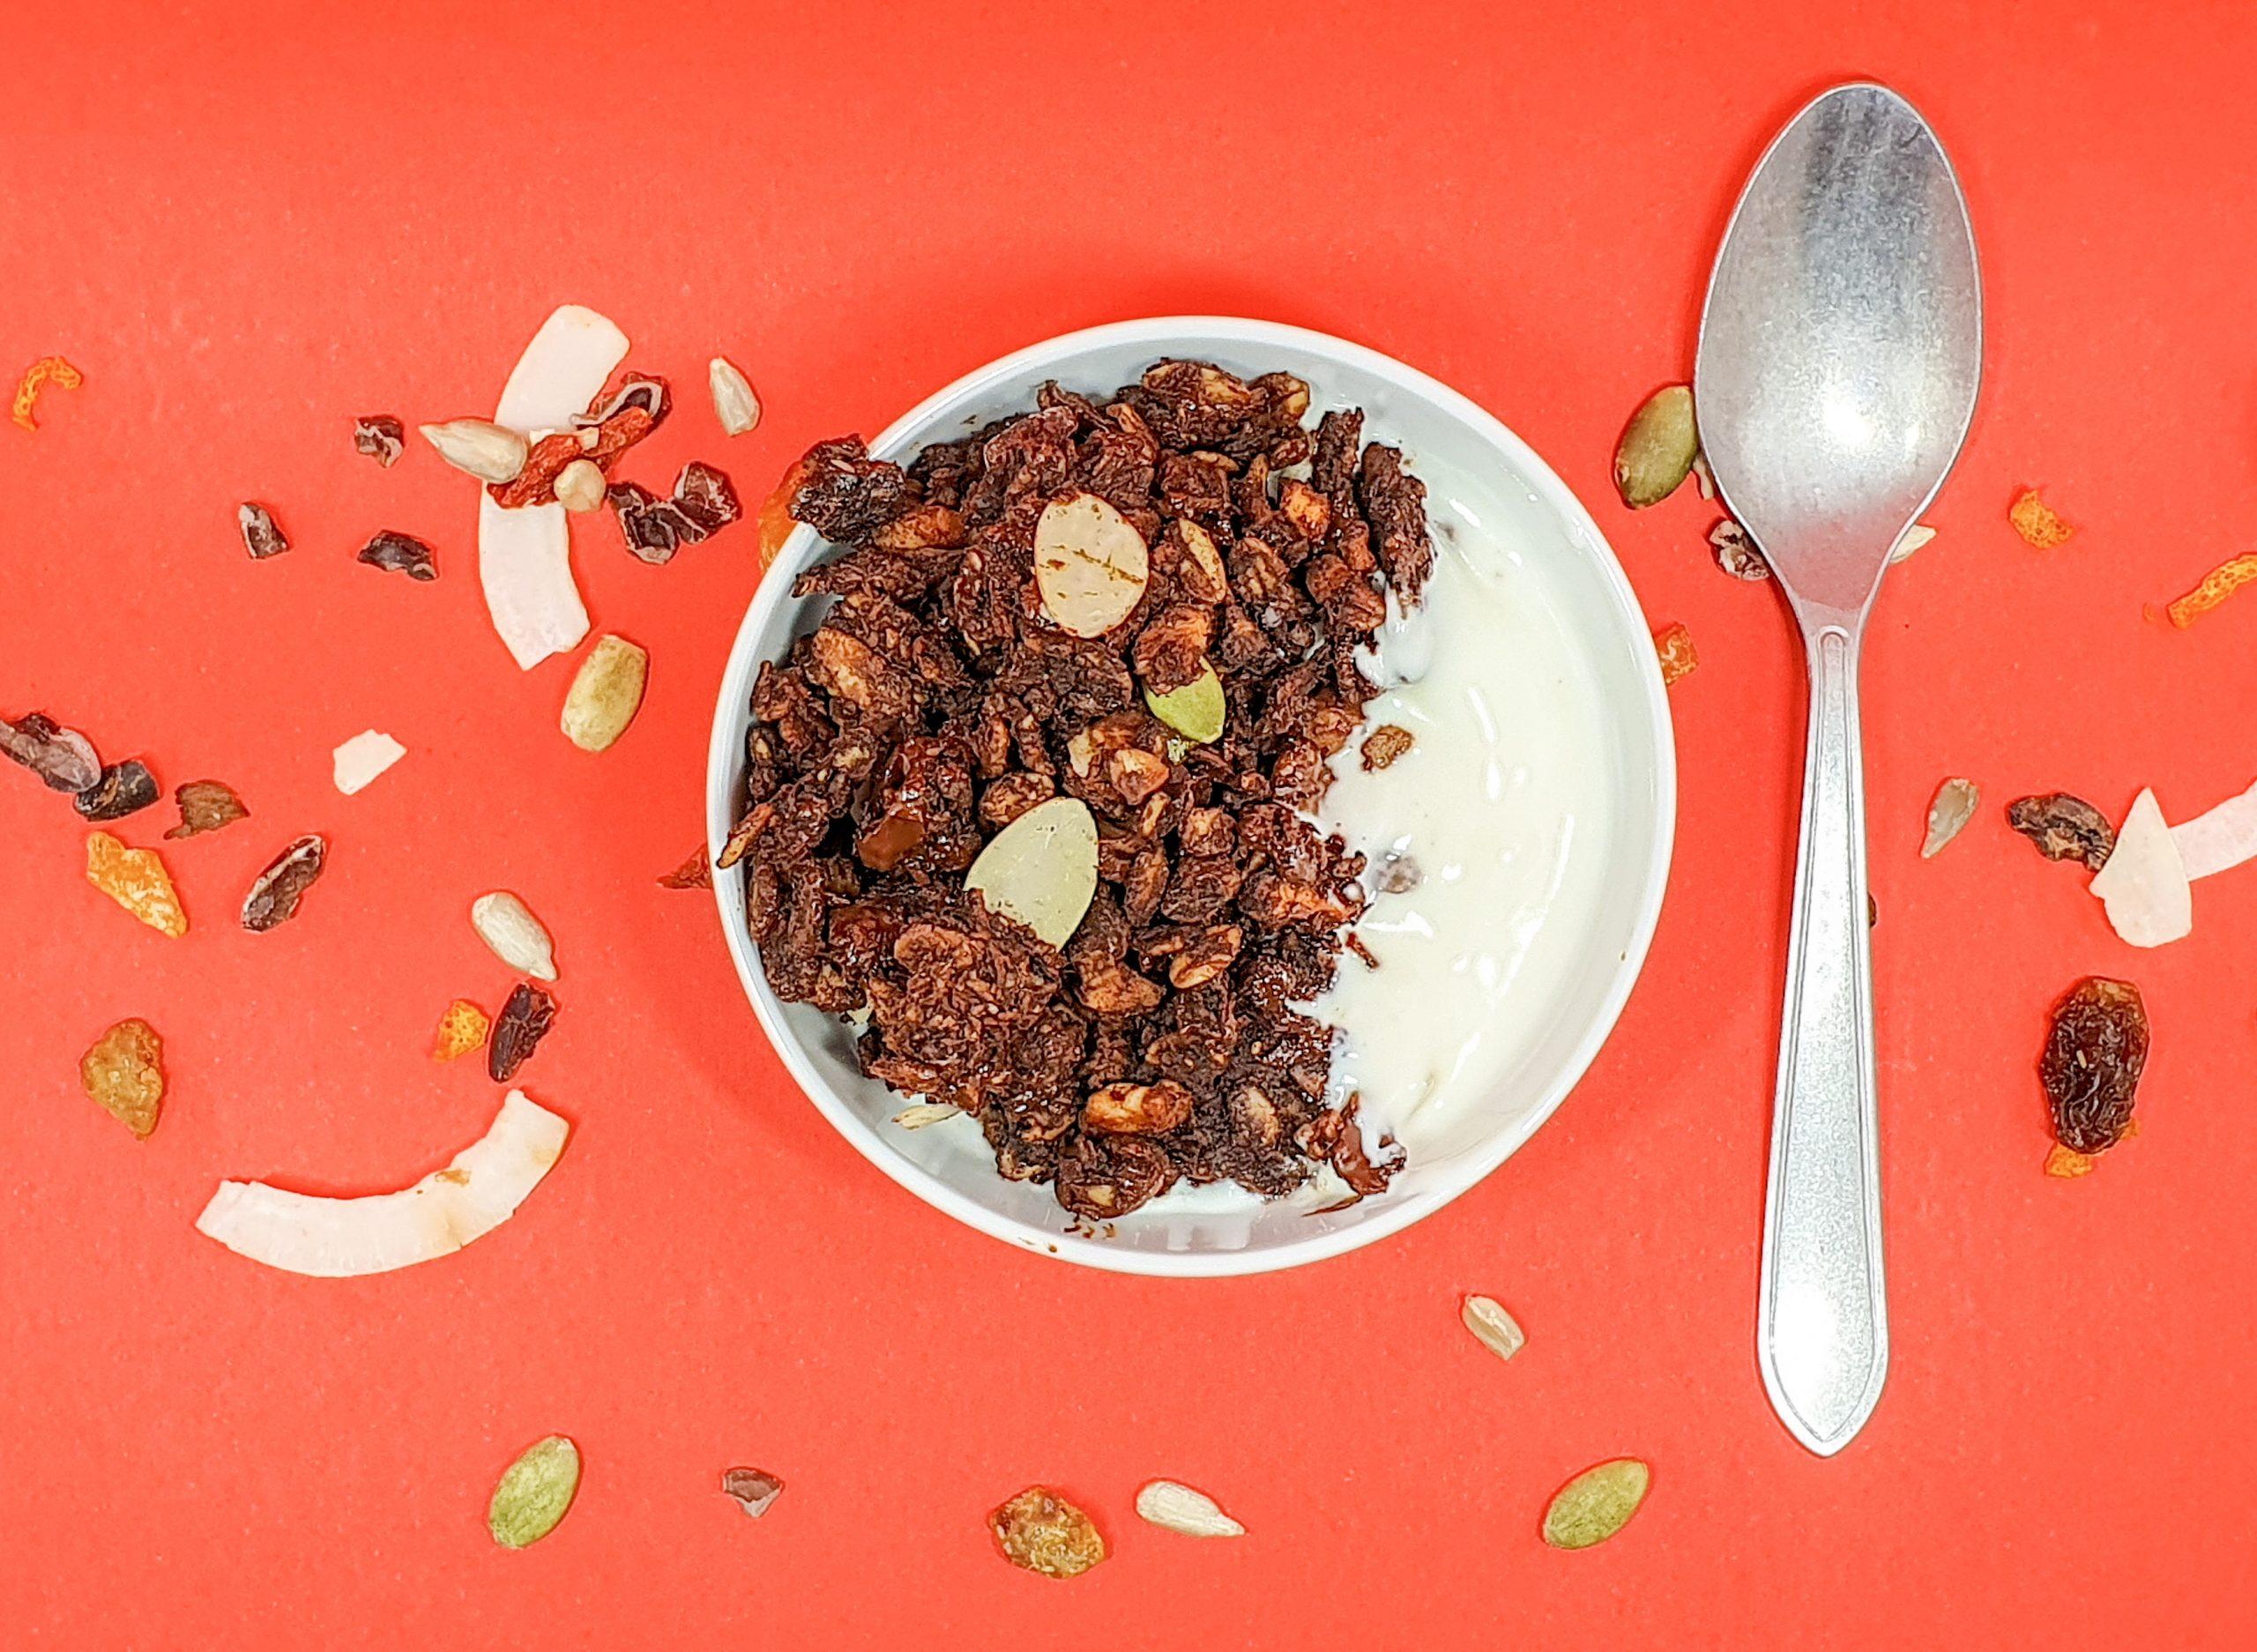 Small bowl with healthy chocolate sea salt granola with yogurt